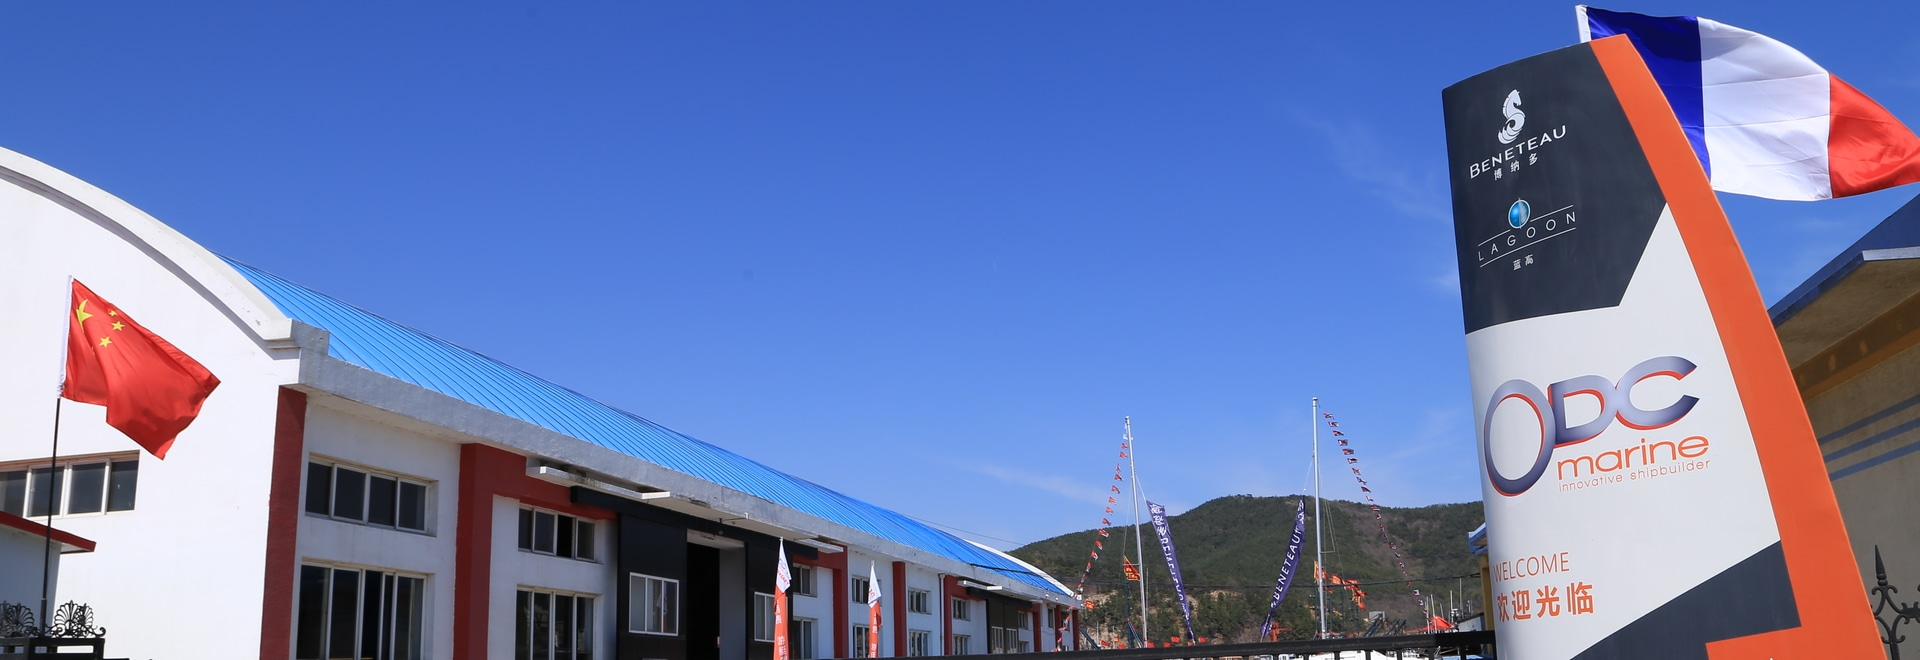 ODC Marinewerft